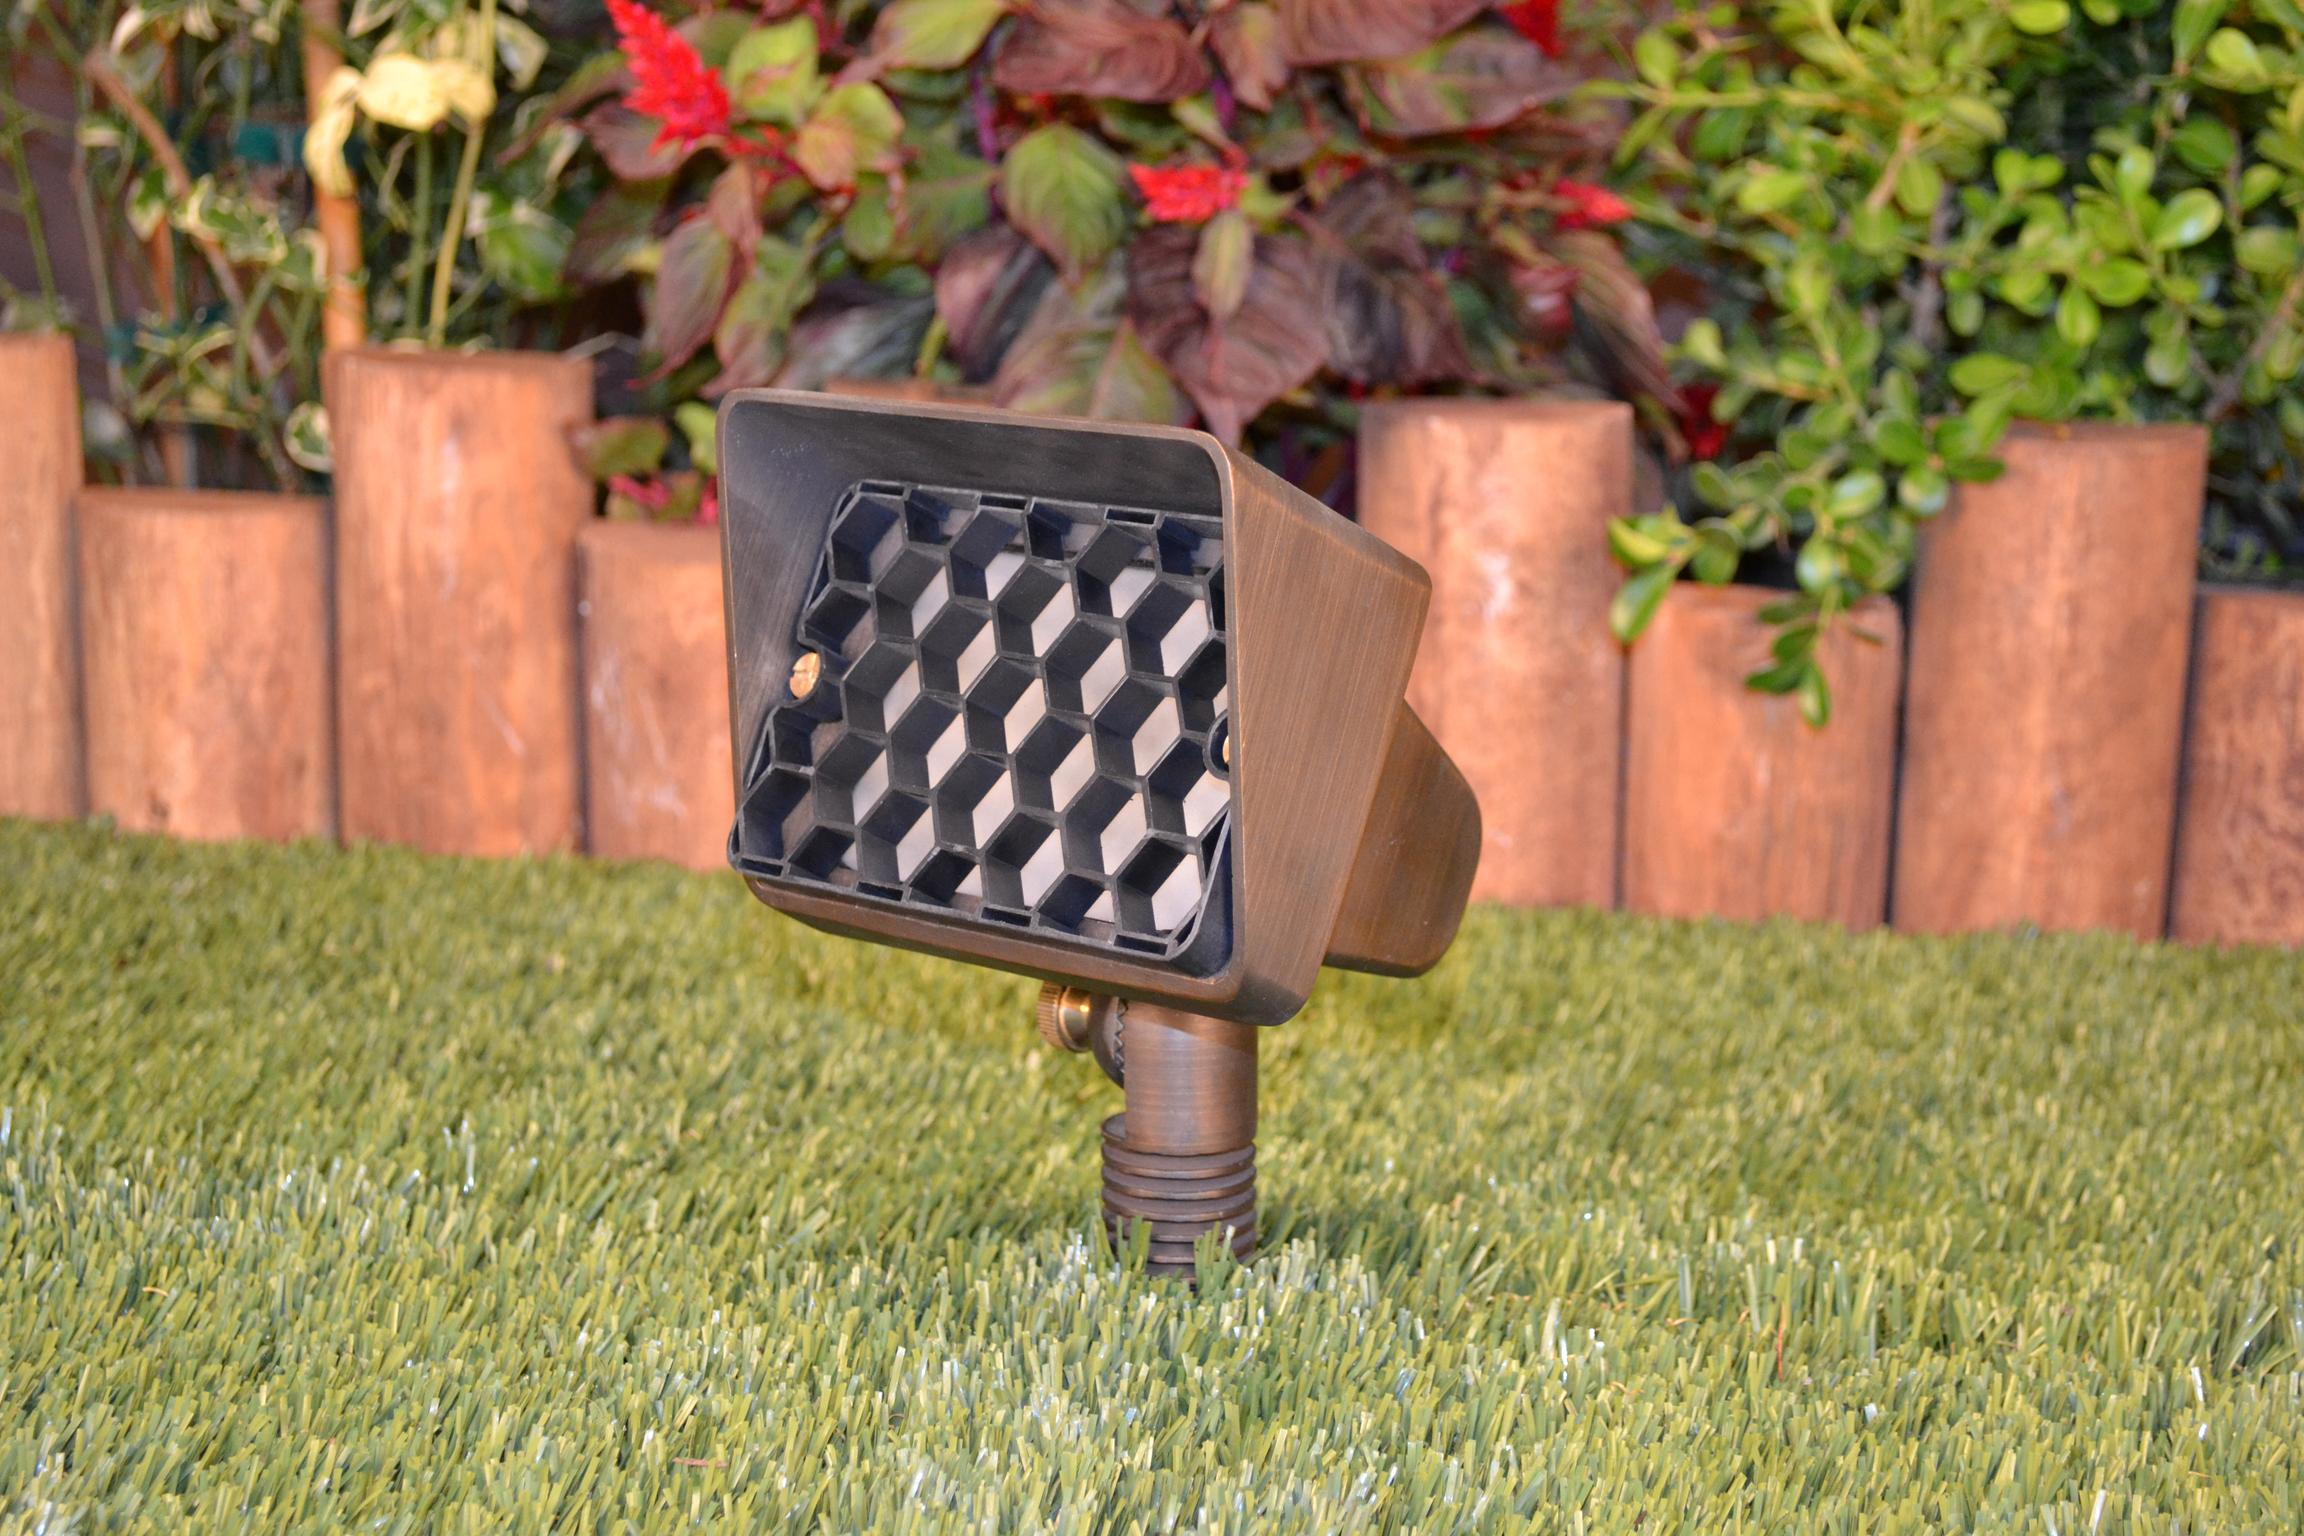 Unique Lighting Systems Starburst 12 Volt Brass Up Light - Yard ...